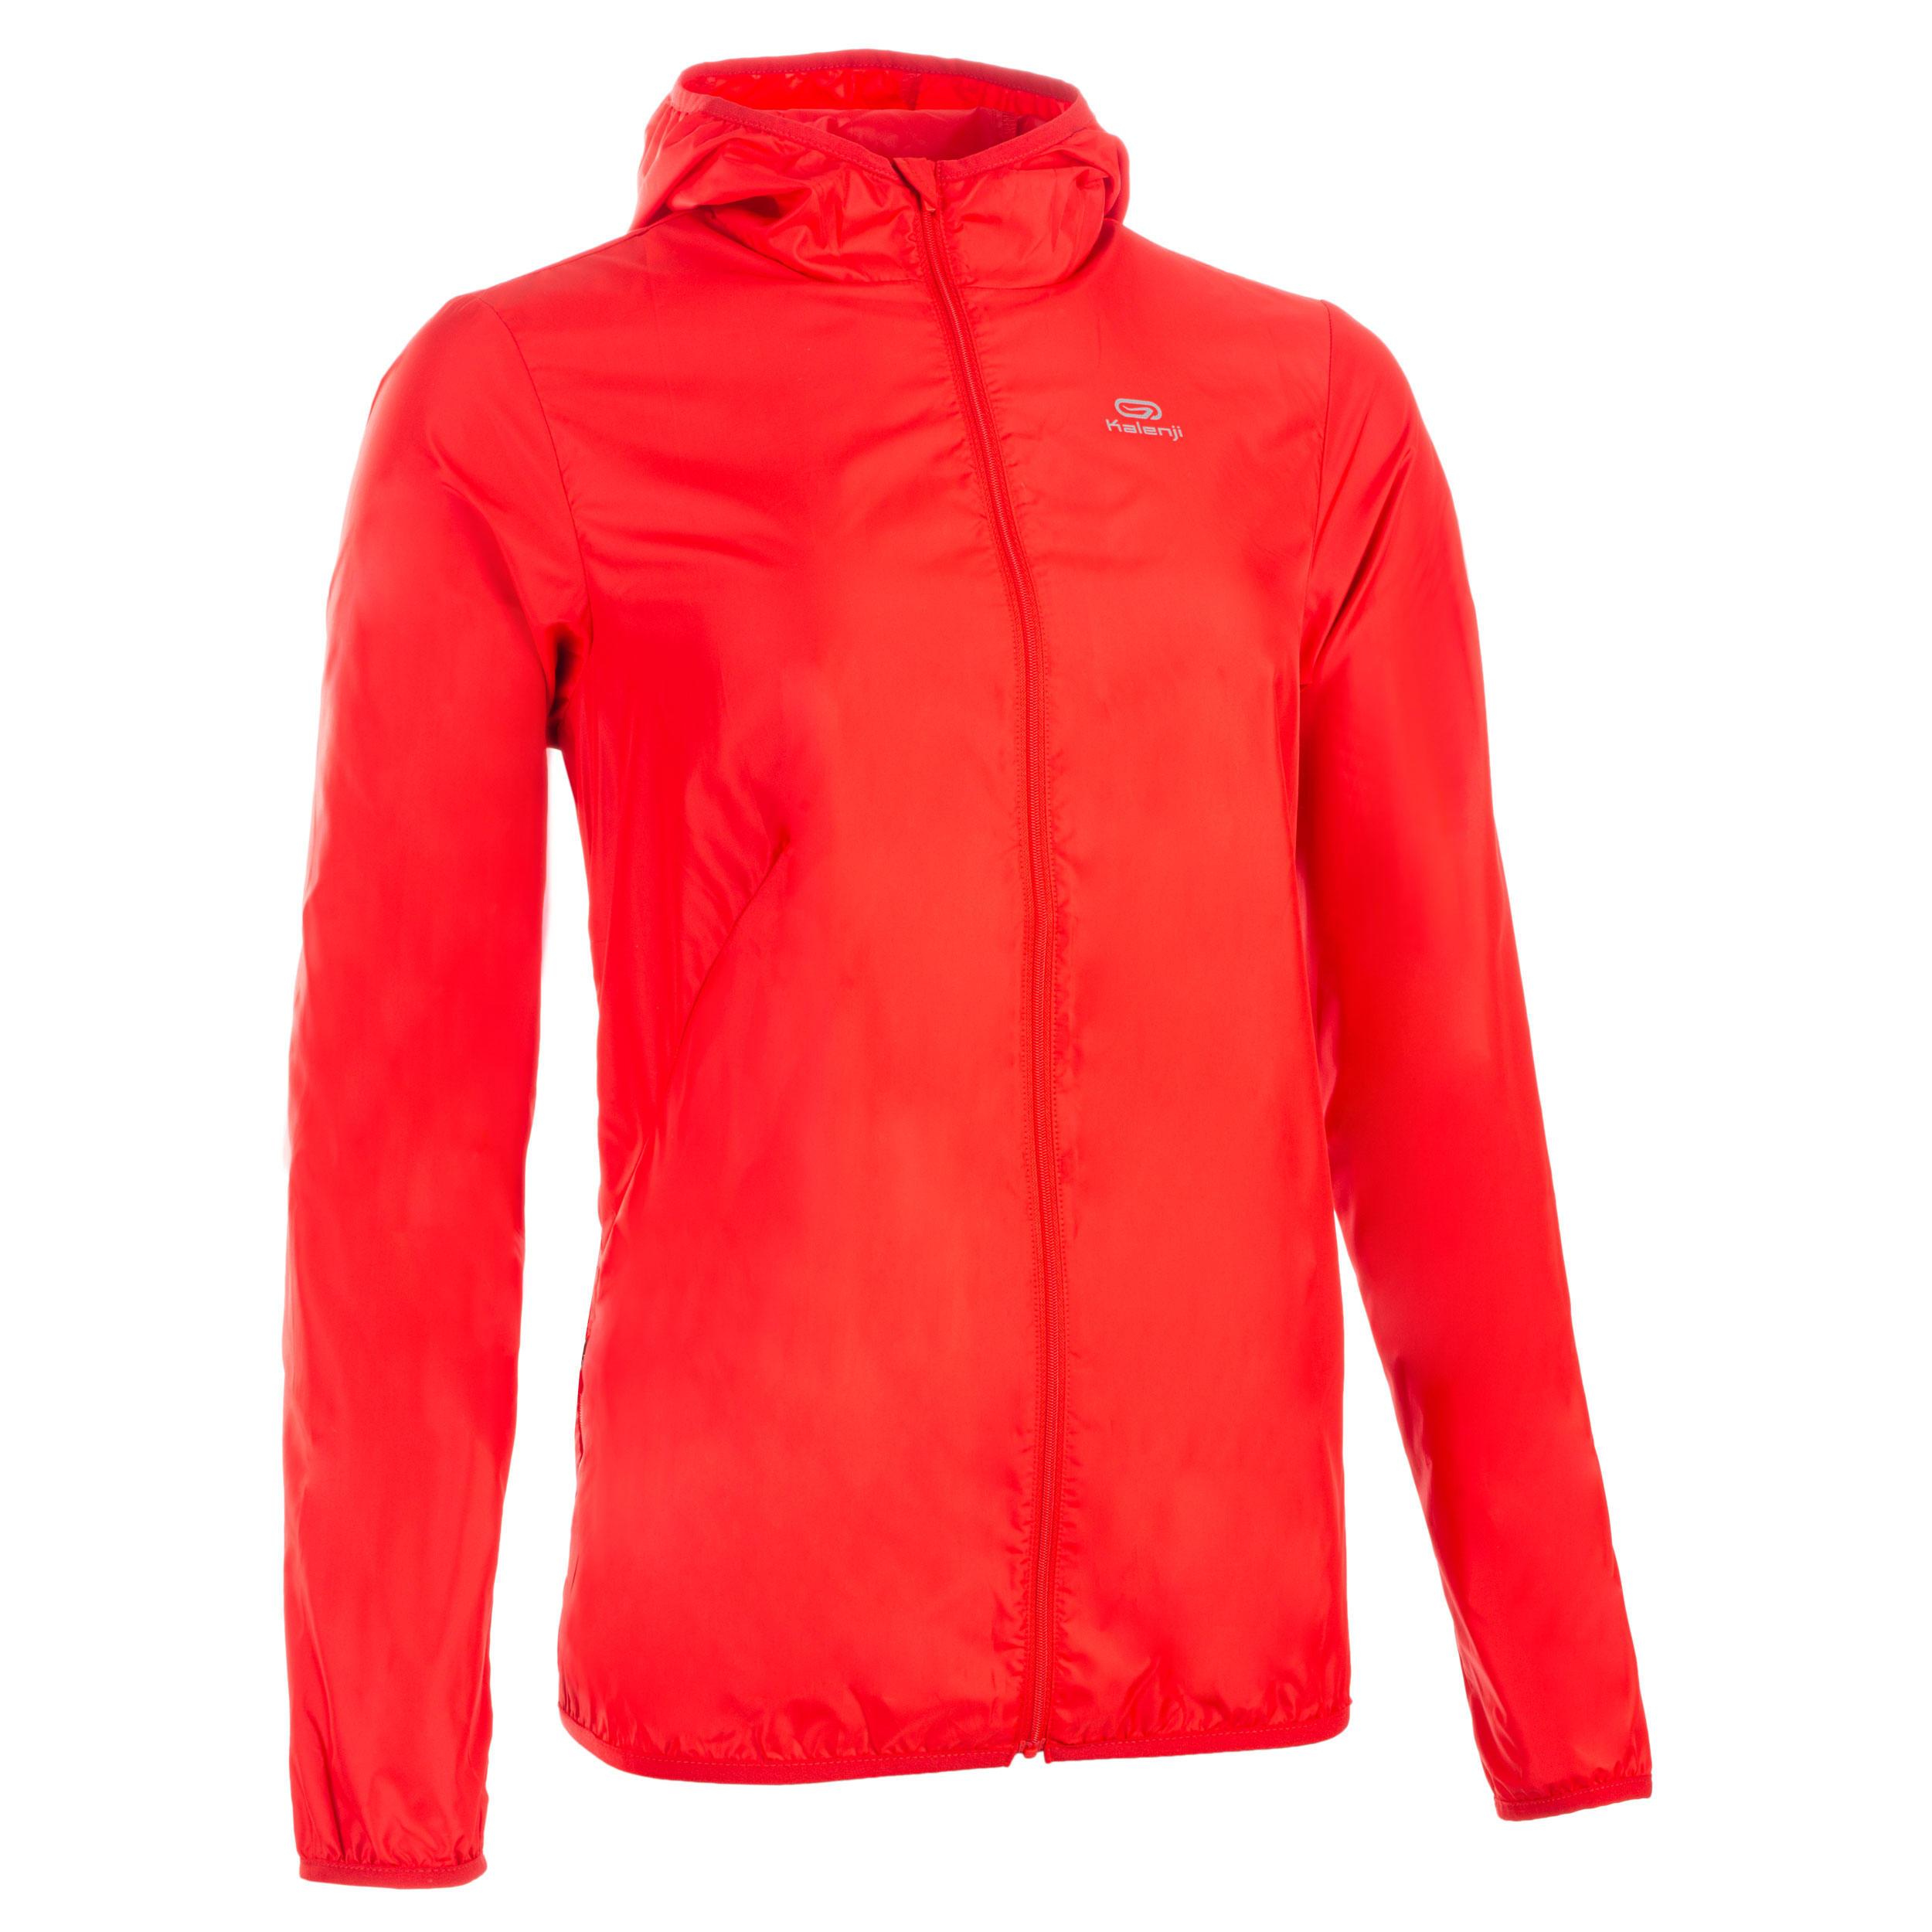 Jachetă protecție vânt Adulți imagine produs